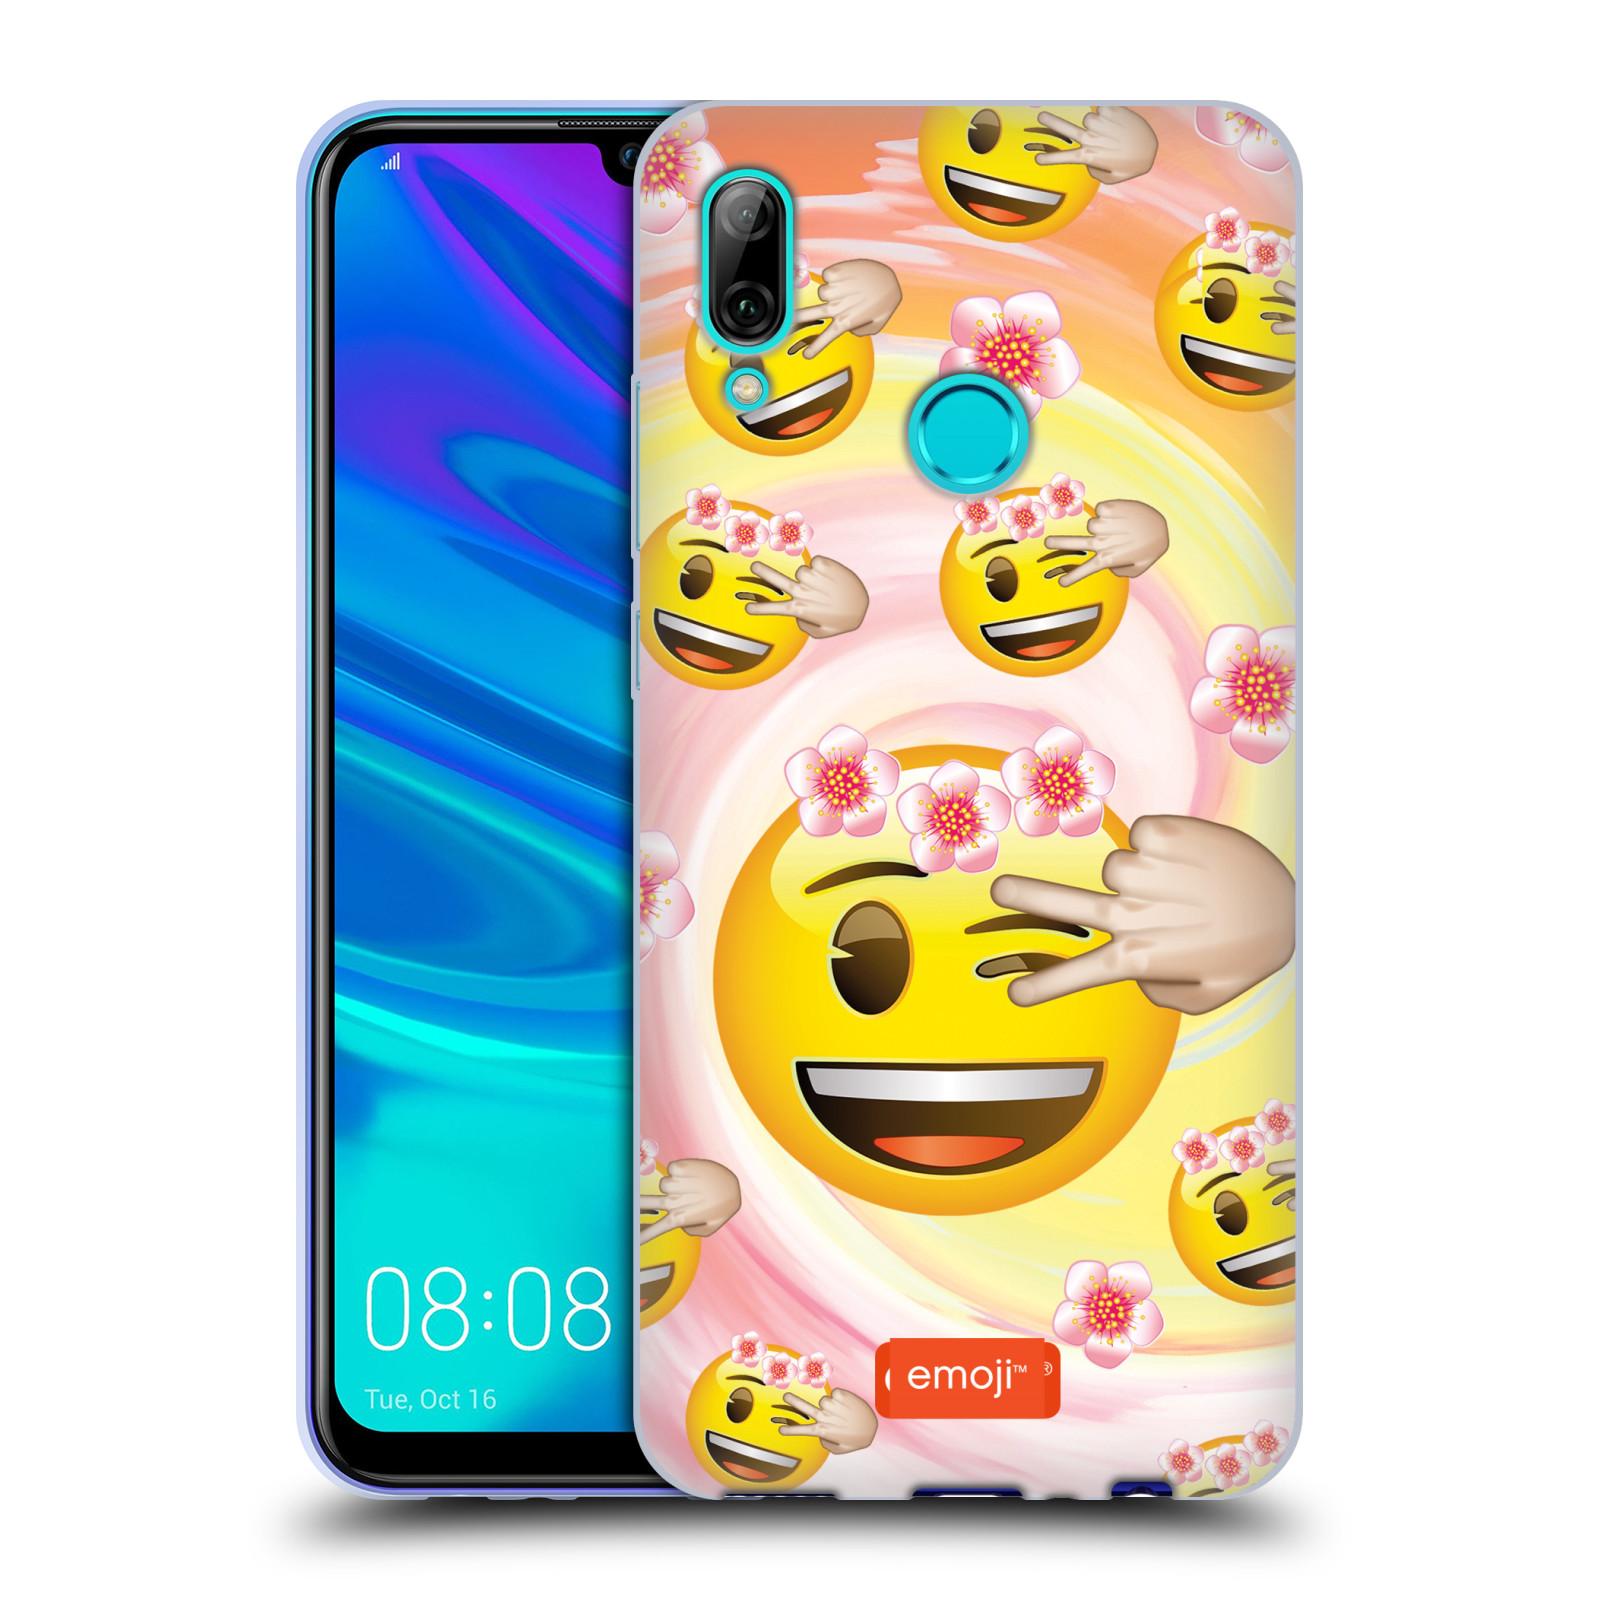 Silikonové pouzdro na mobil Huawei P Smart (2019) - Head Case - EMOJI - Mrkající smajlíci a kytičky